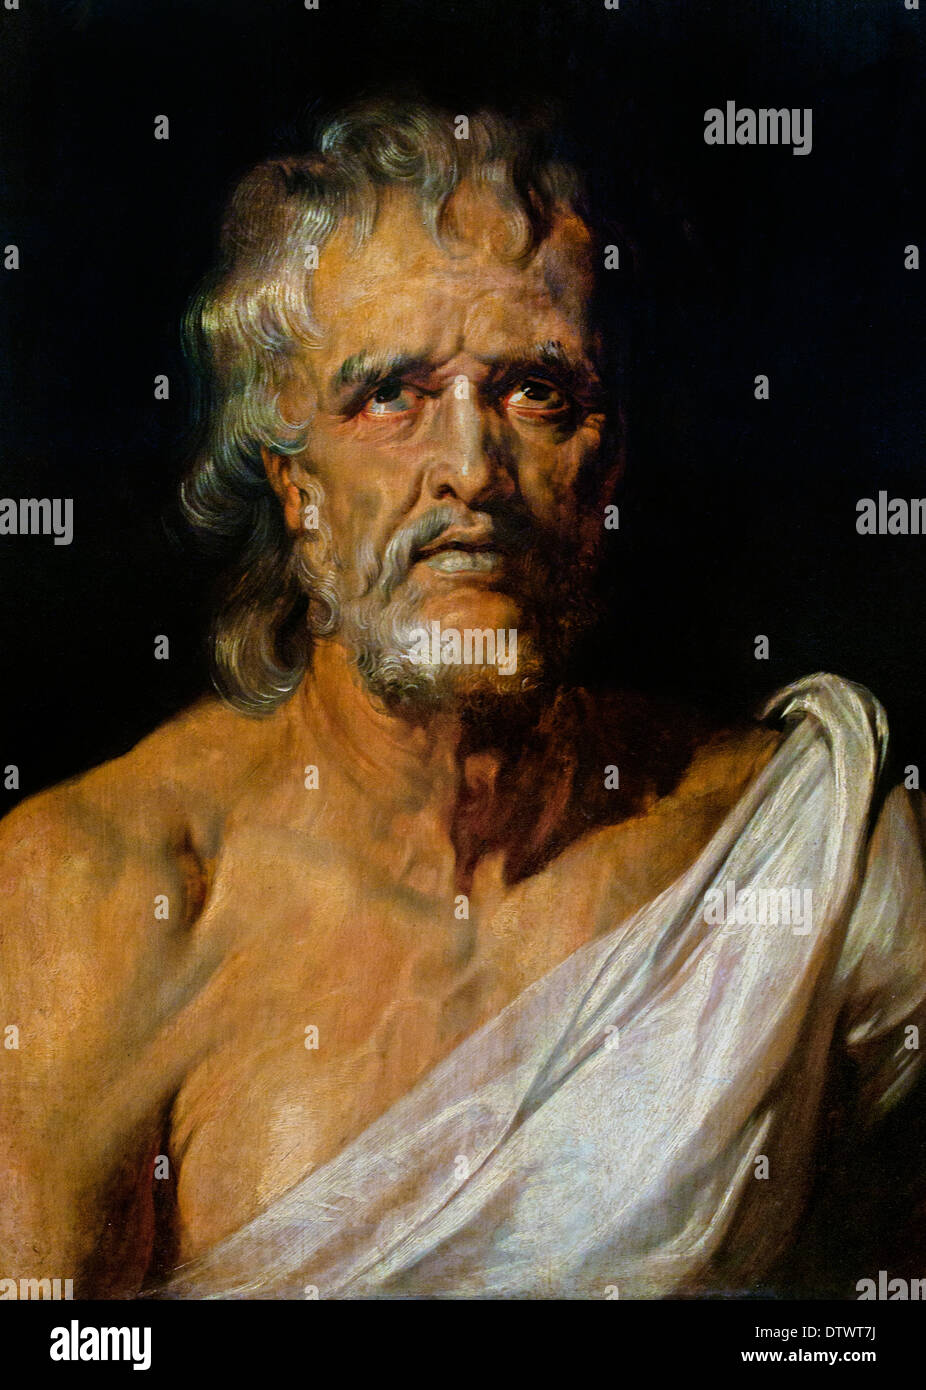 Half-length portrait of the philosopher Seneca by Peter Paul Rubens 1577 - 1640 Flemish Belgian Belgium - Stock Image